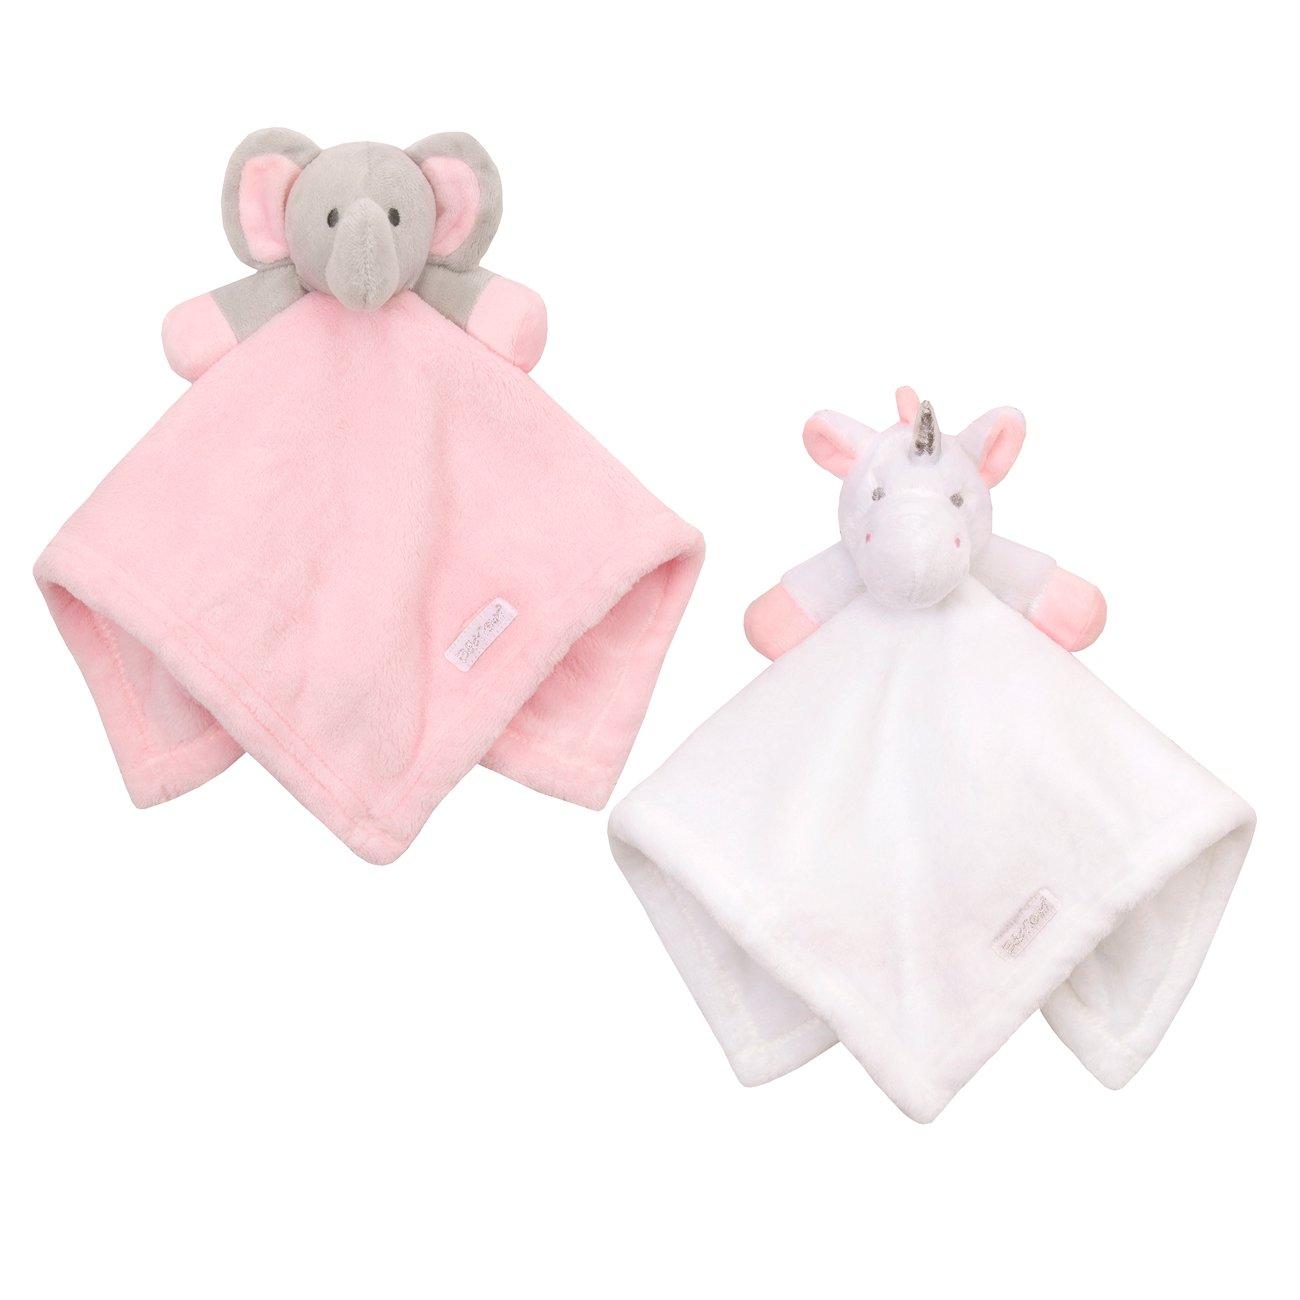 Babytown Baby Boys & Girls Animal Snuggle Comforter Blanket Pink Elephant White Unicorn